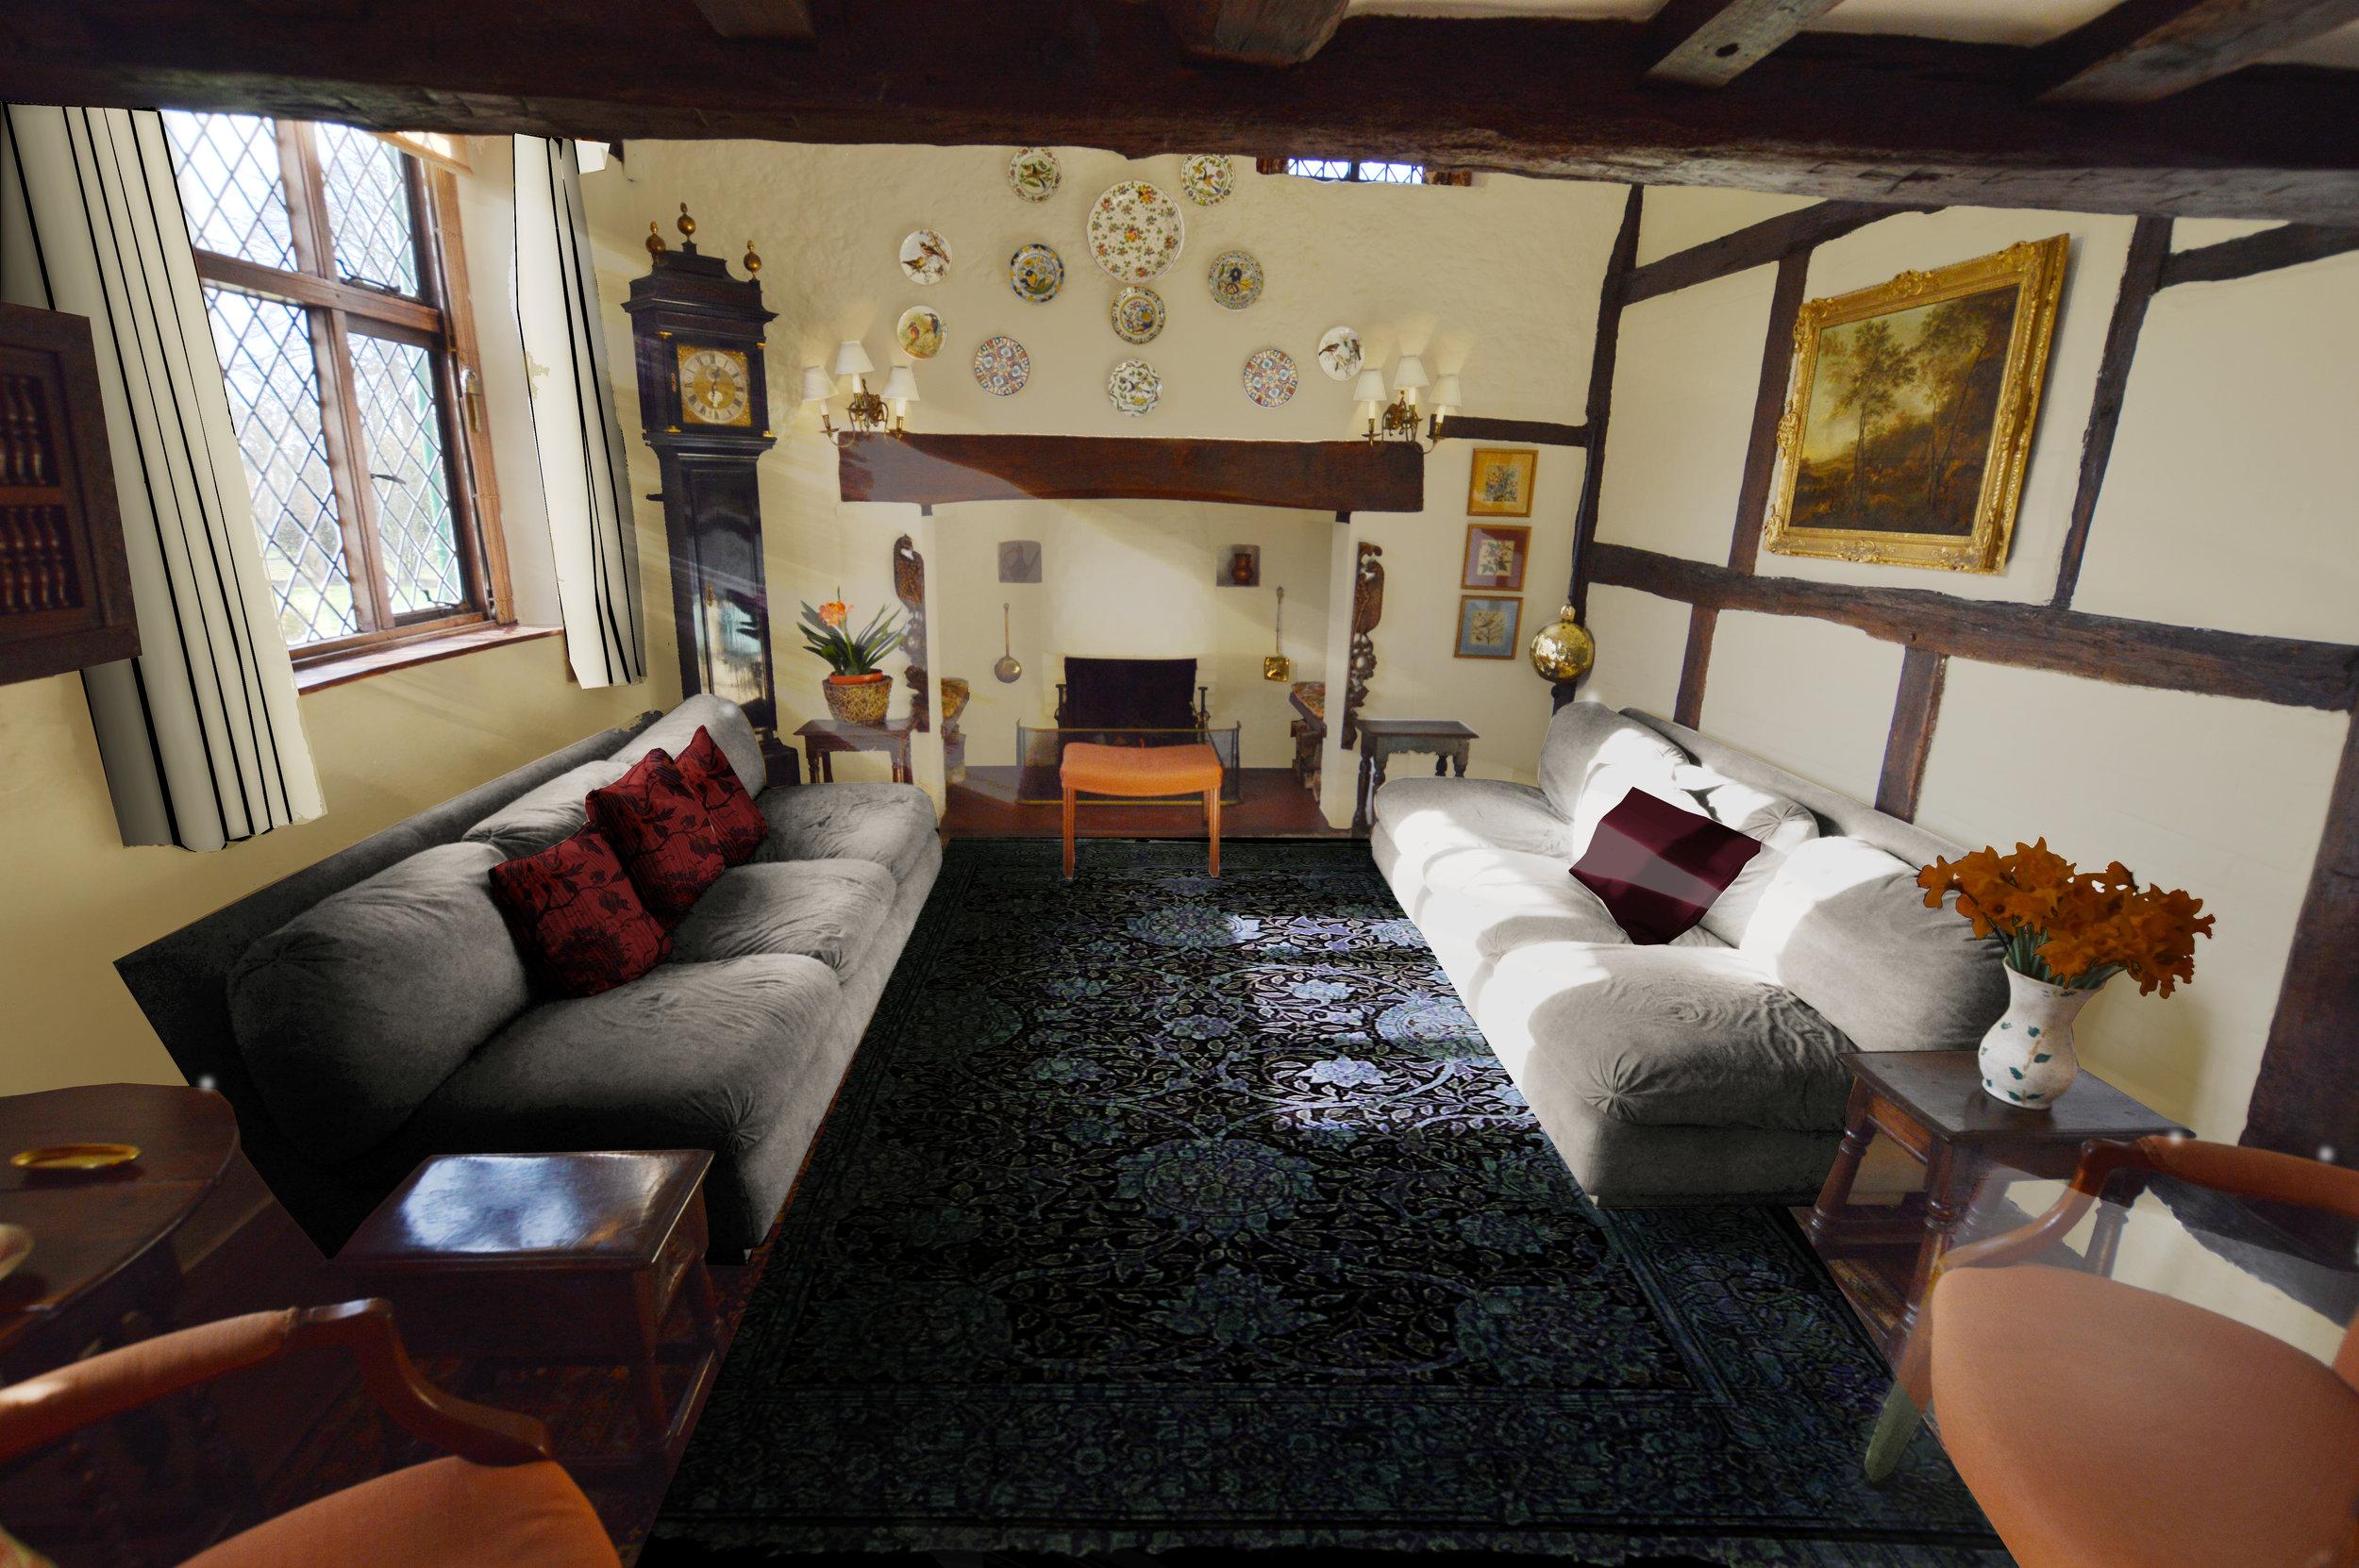 Interior Design for Main Living Room (Option 1)